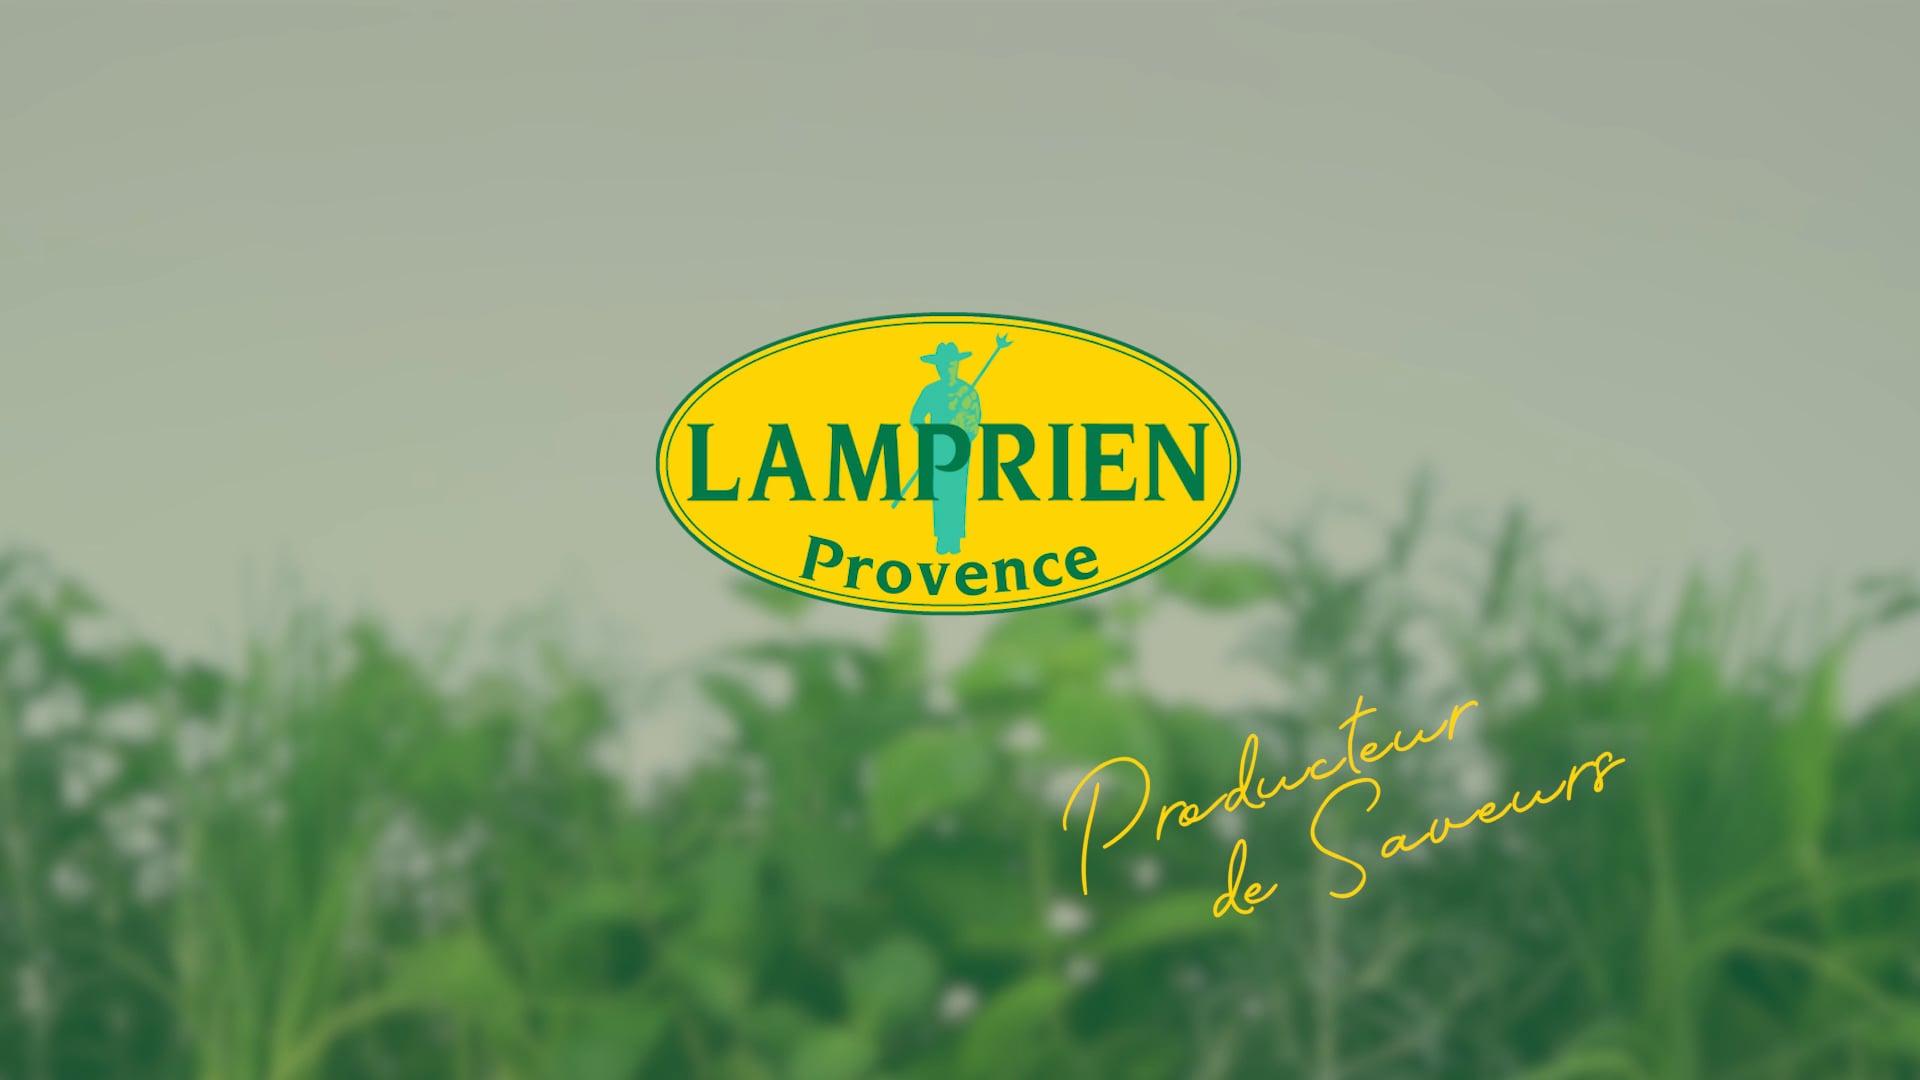 LAMPRIEN PROVENCE